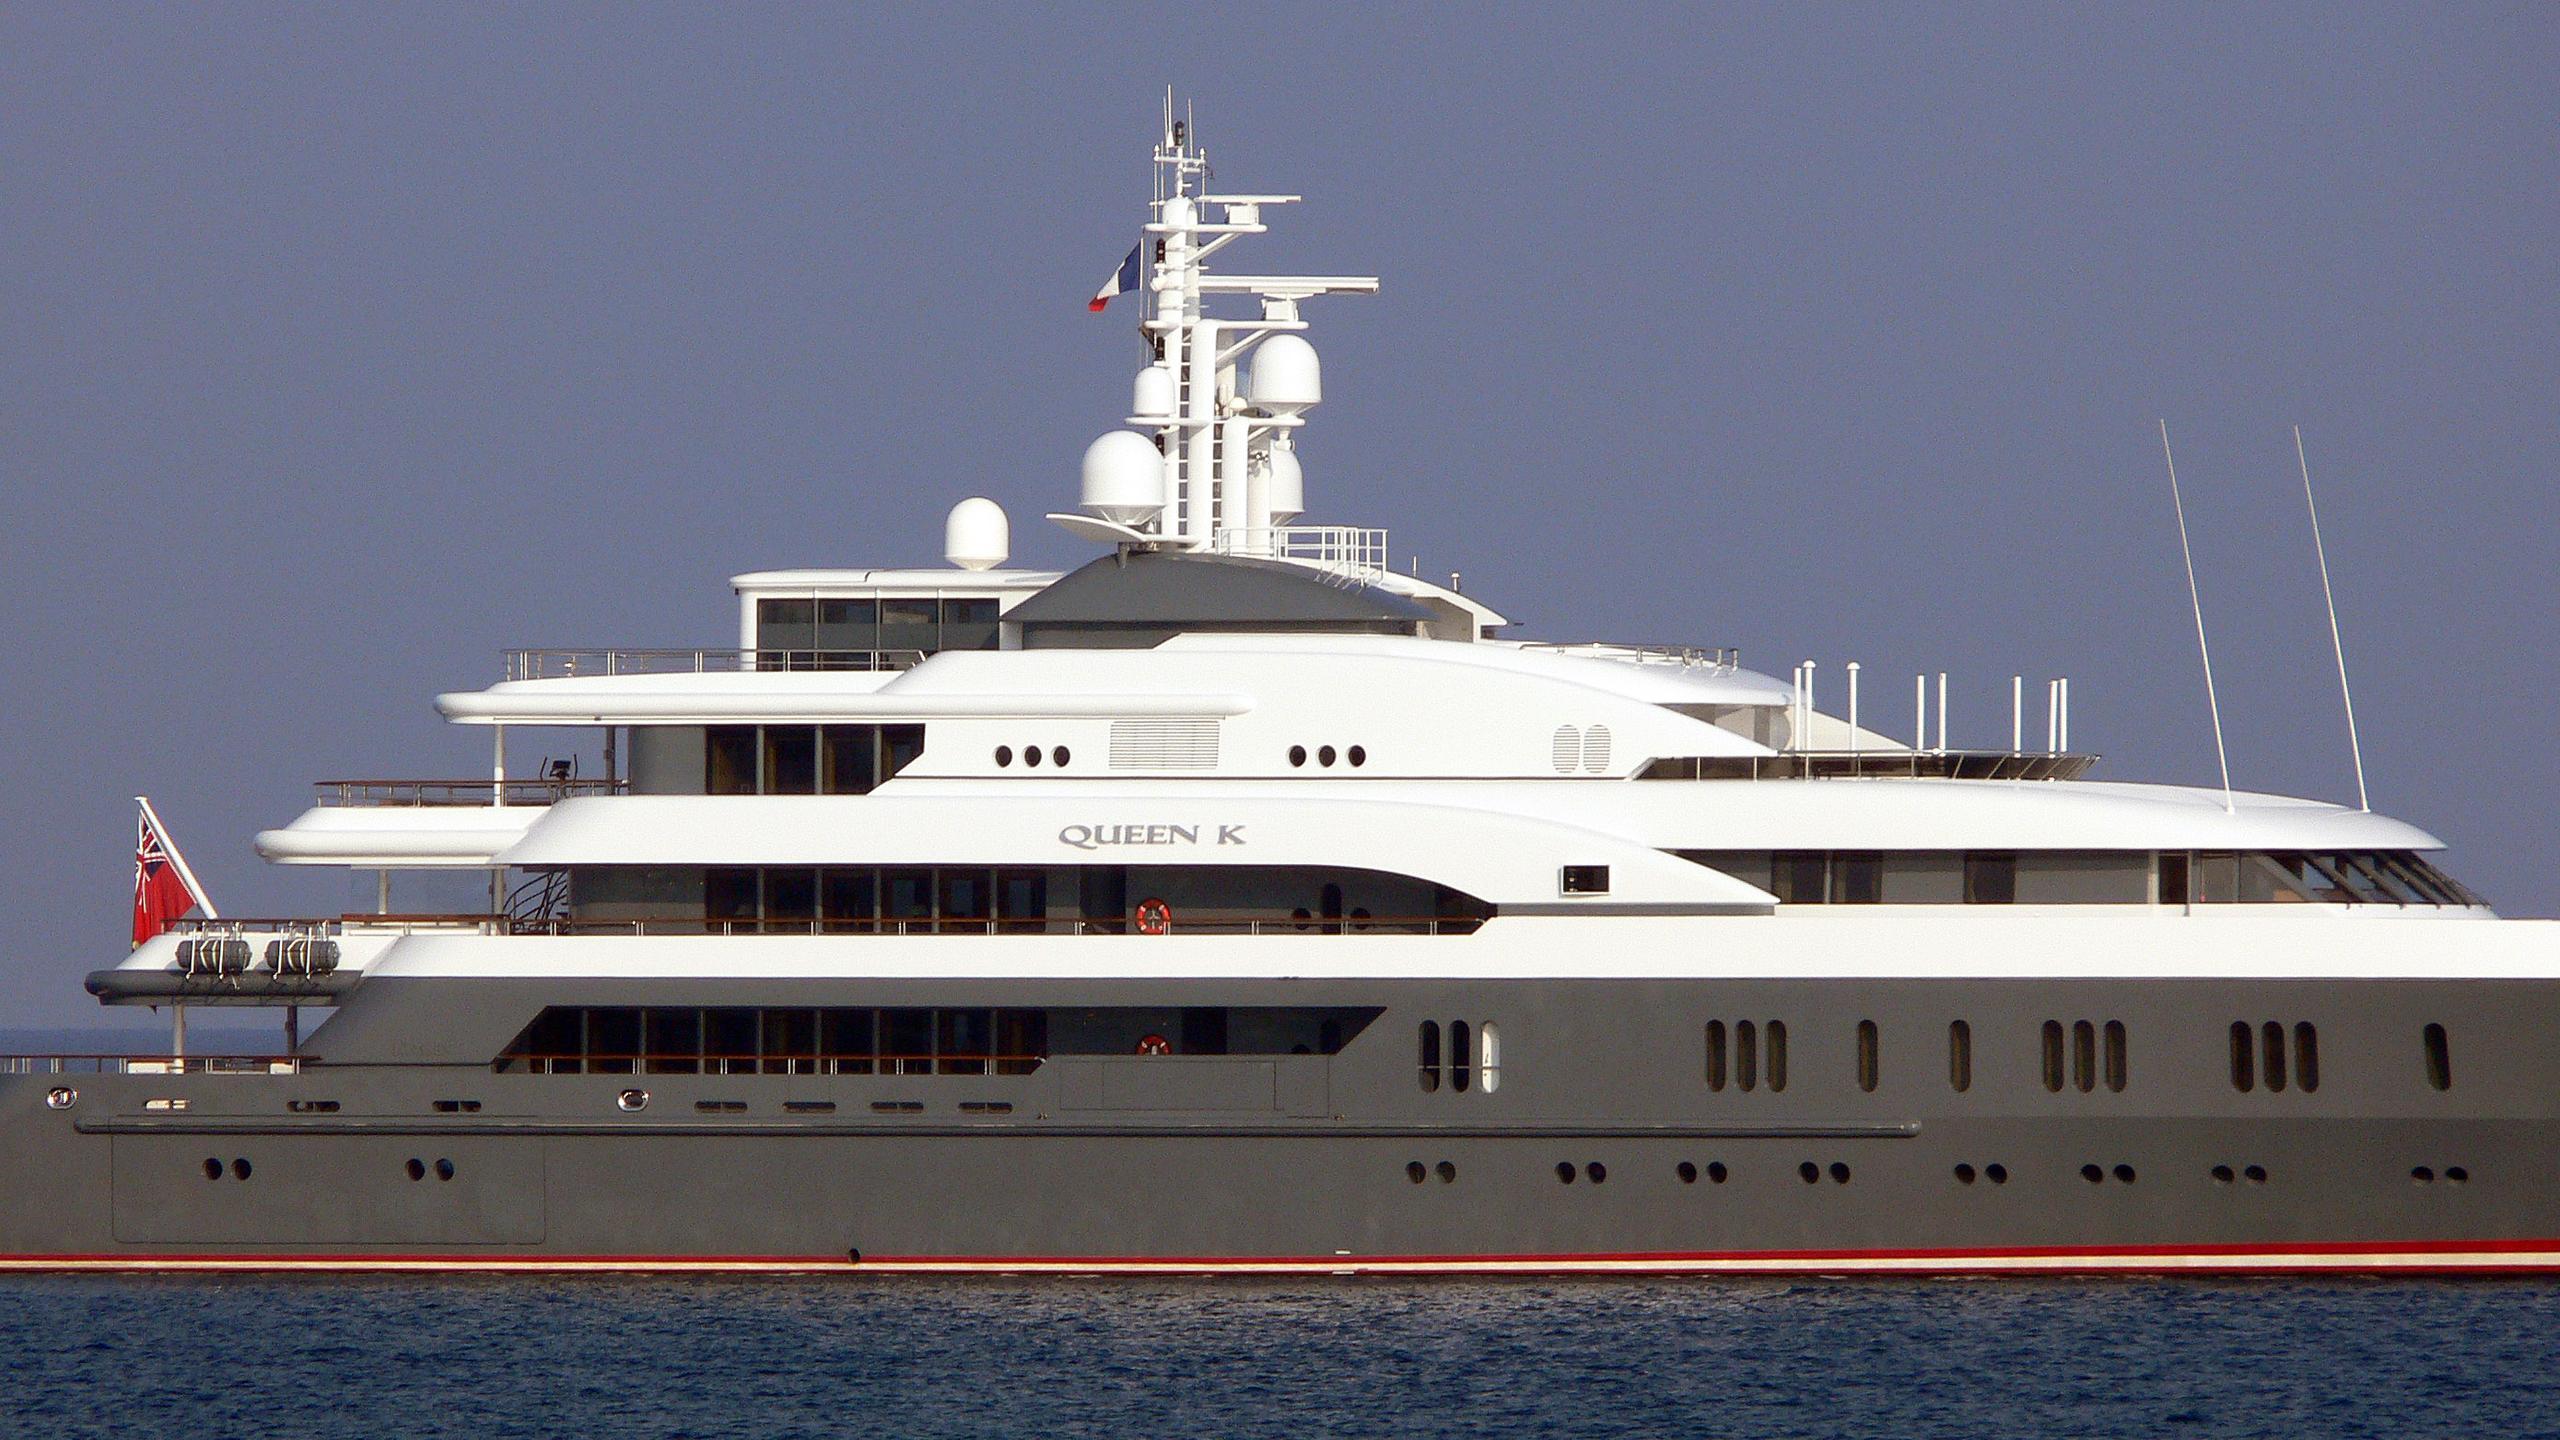 queen-k-motor-yacht-lurssen-2004-73m-profile-details